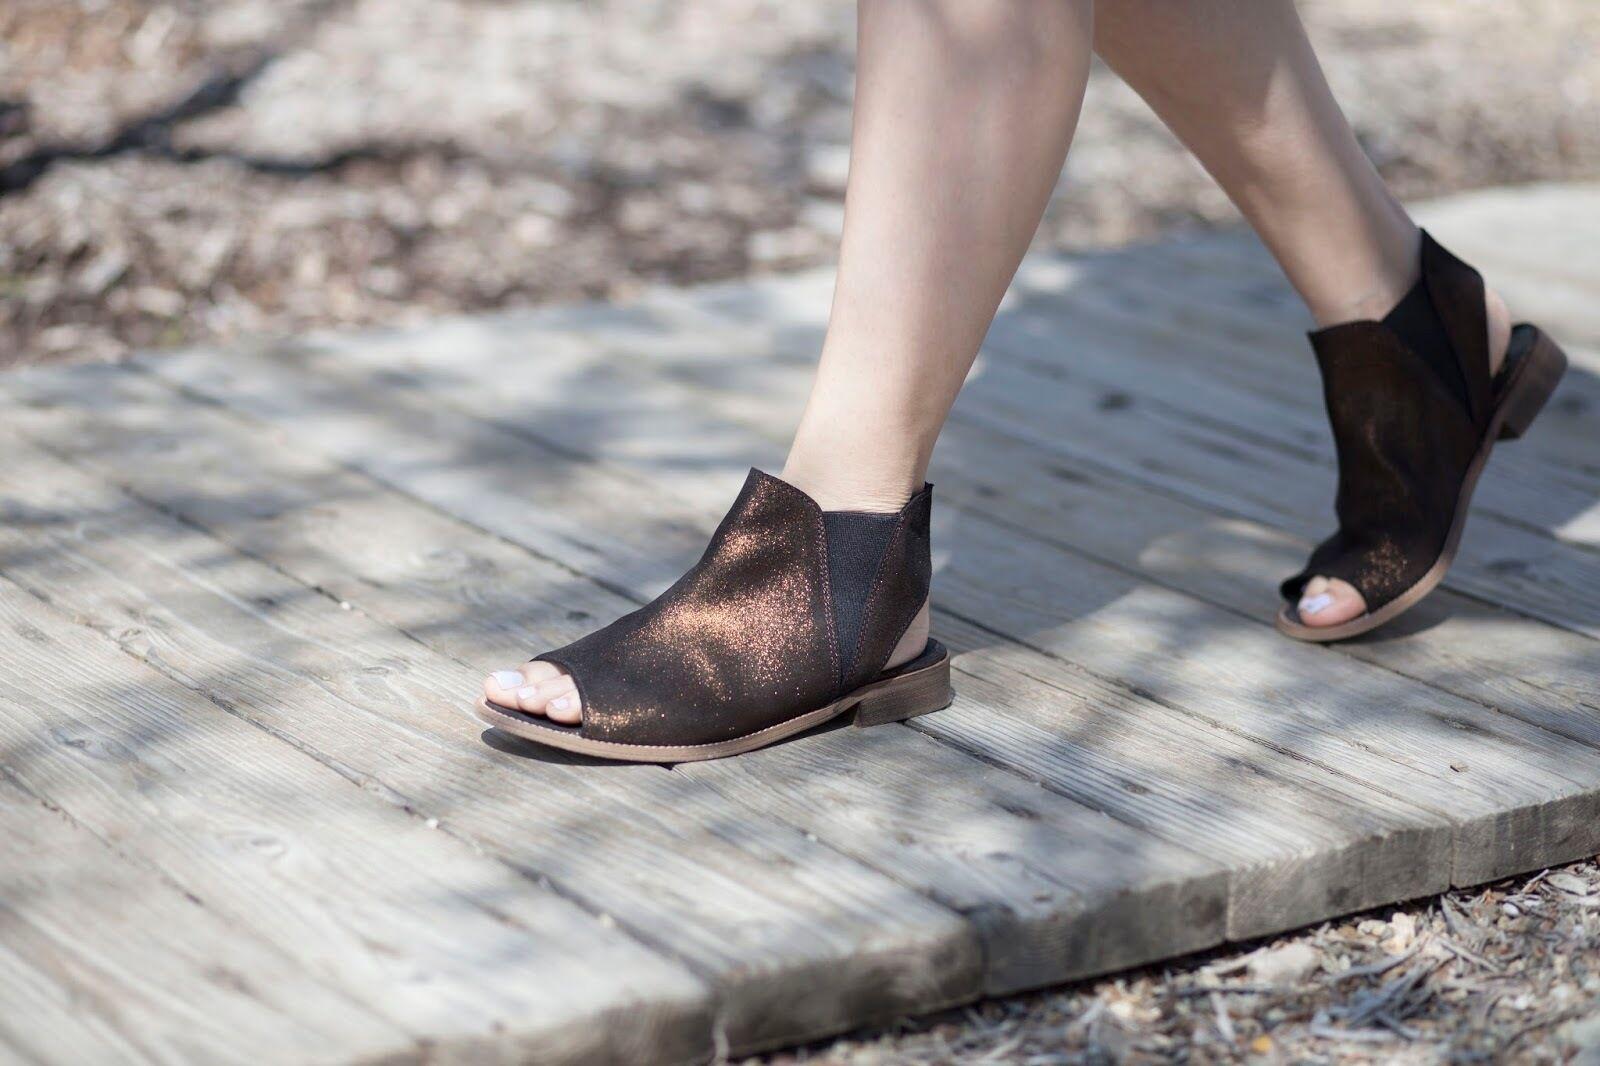 NEW Musse Size & Cloud Ciara Sandal, Bronze/Black Metallic Leather, Size Musse 6 (37), $90 cdb44d